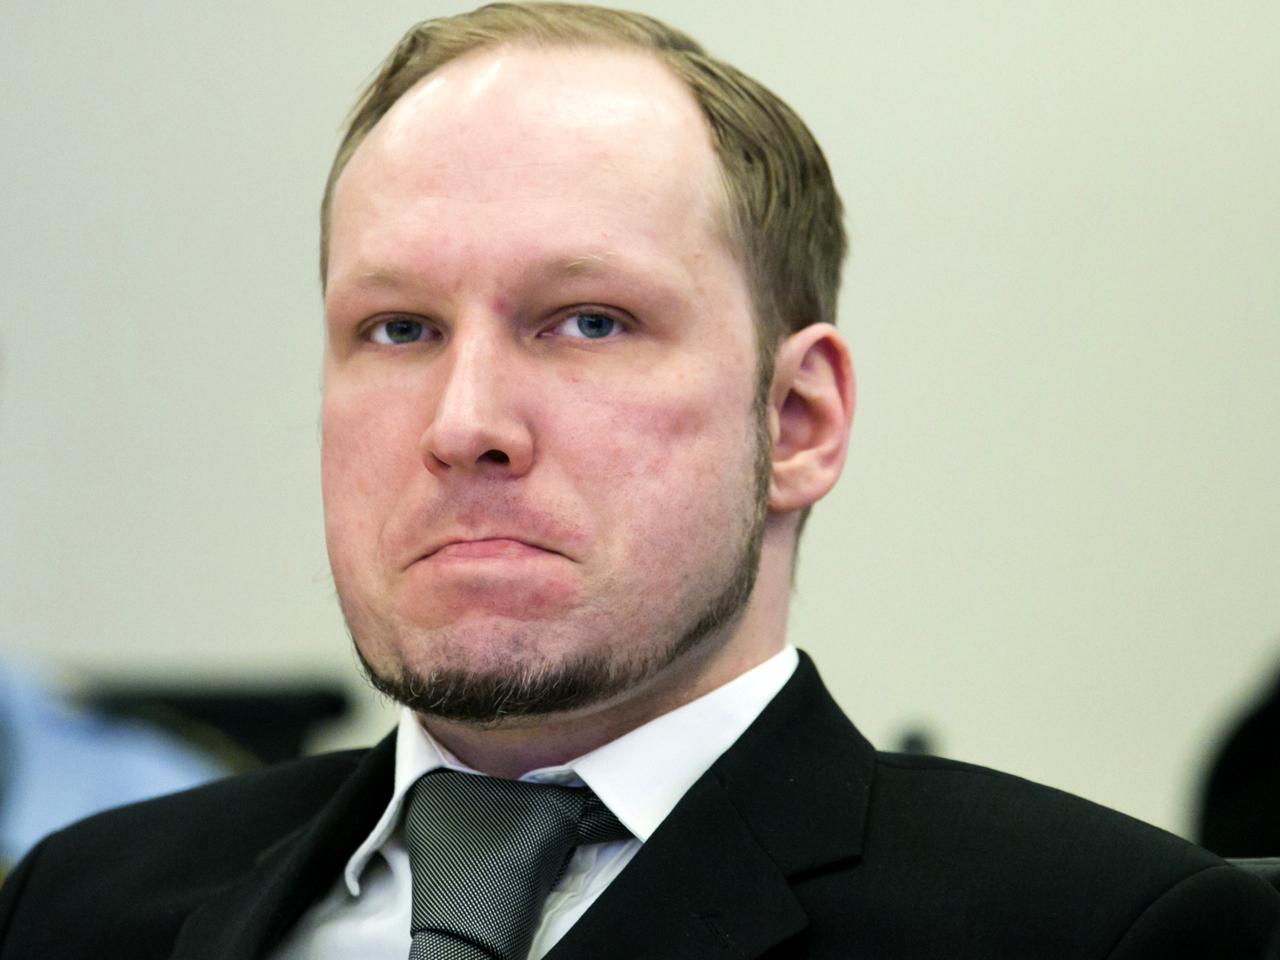 Breivik News: Shoe-thrower Disrupts Trial Of Norway Mass Killer Anders